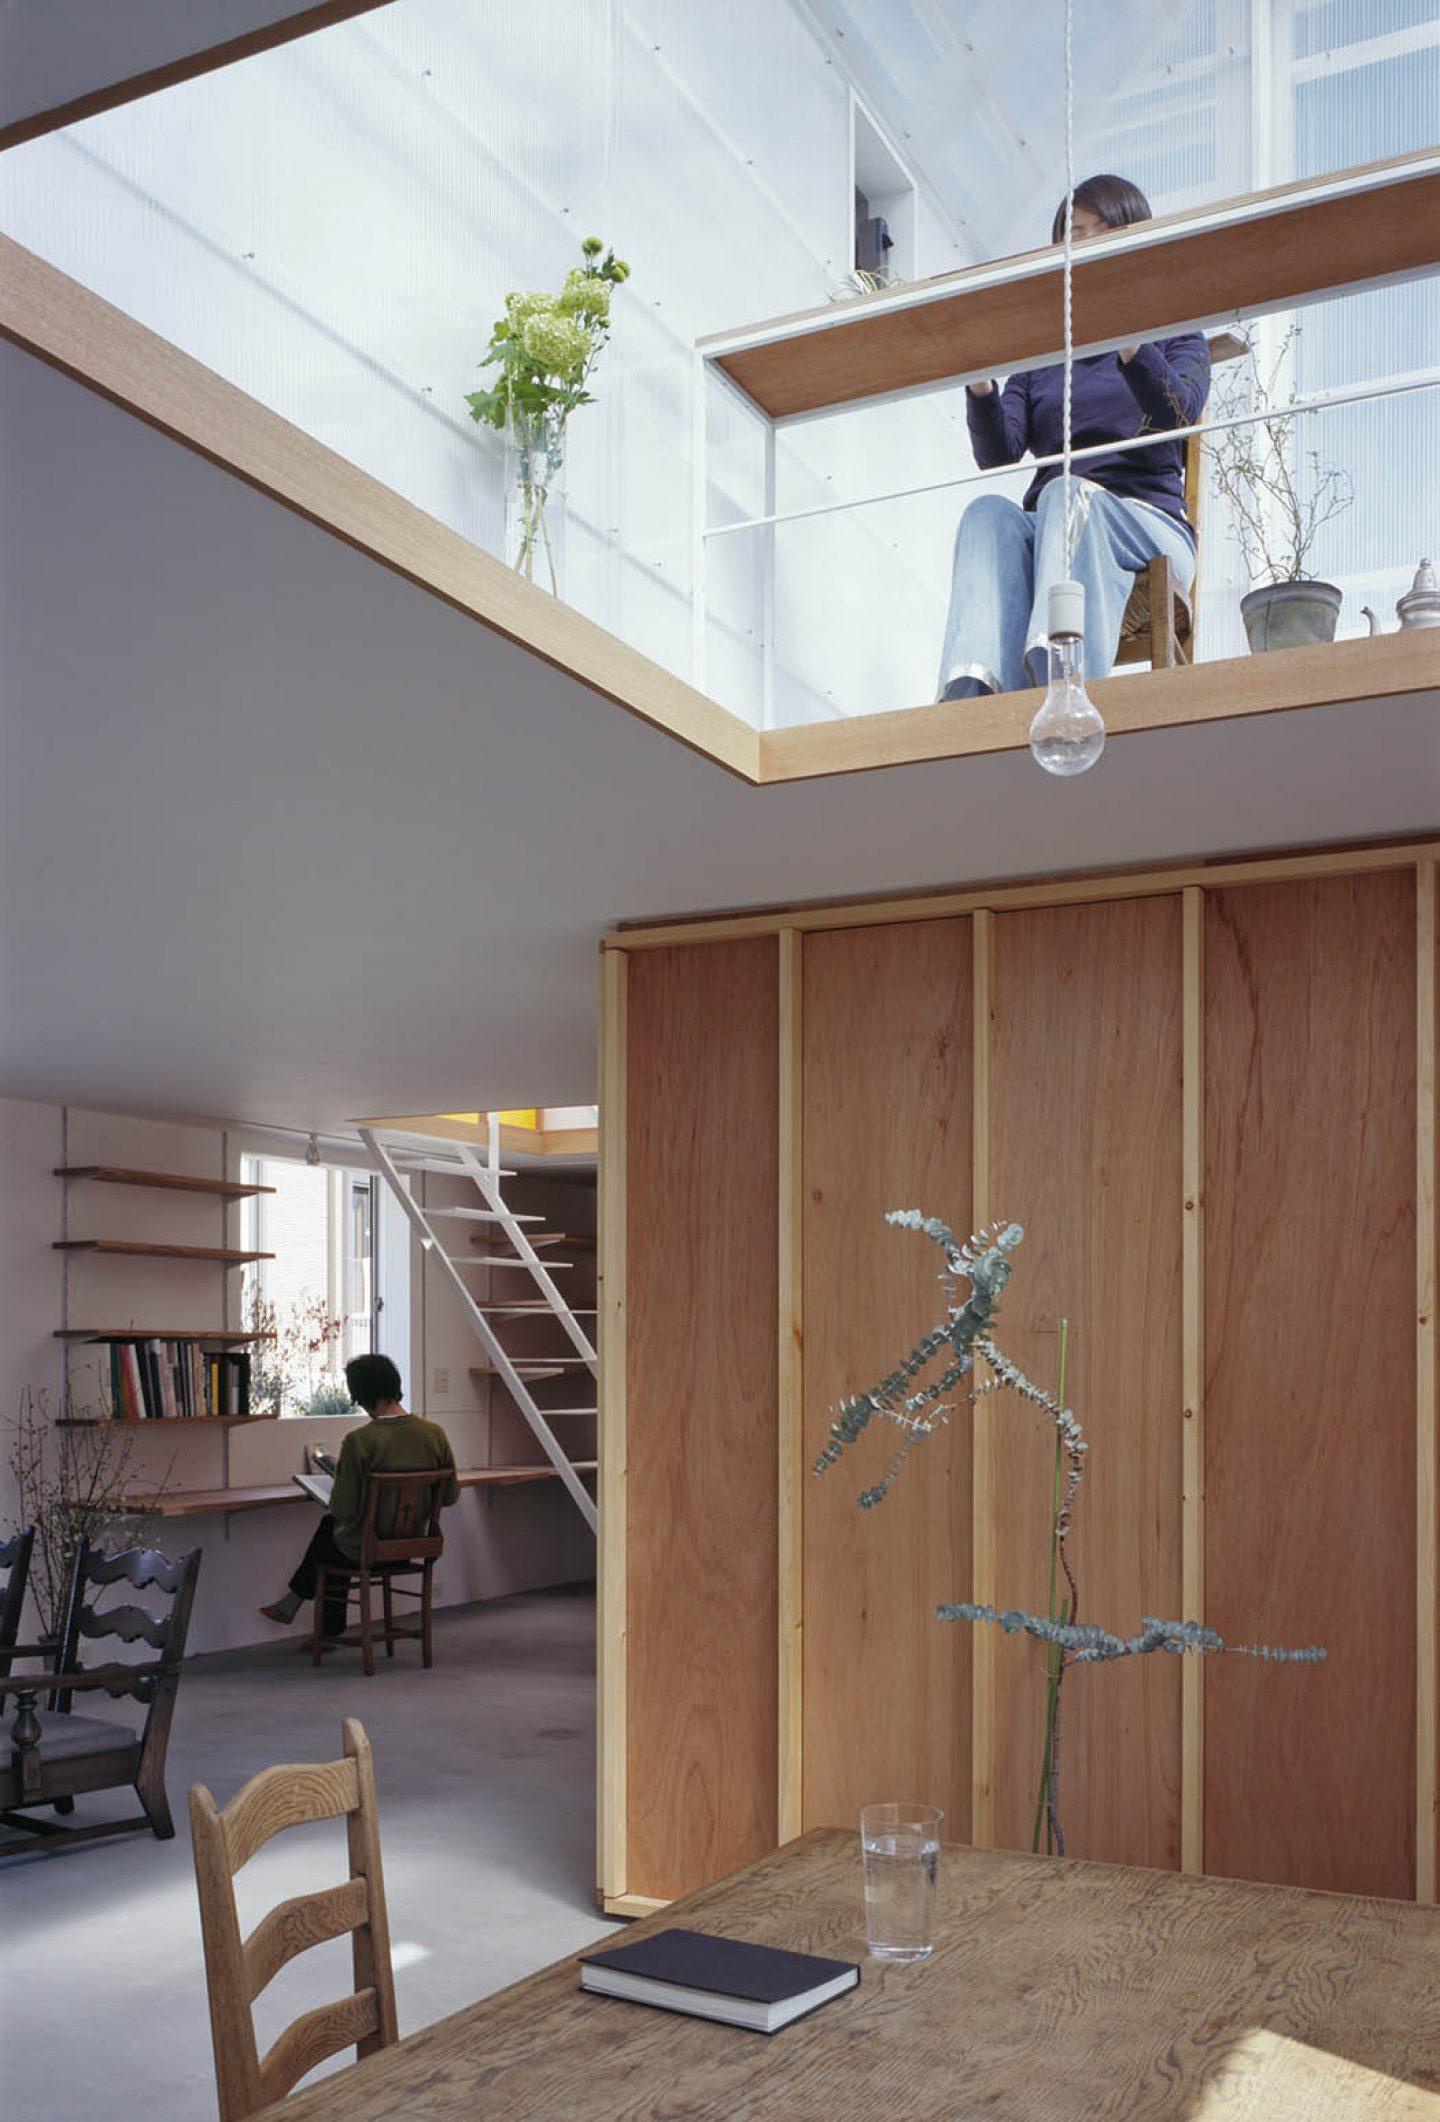 iGNANT_Architecture_Tato_Architects_Yo_Shimada_House_In_Yamasaki_17